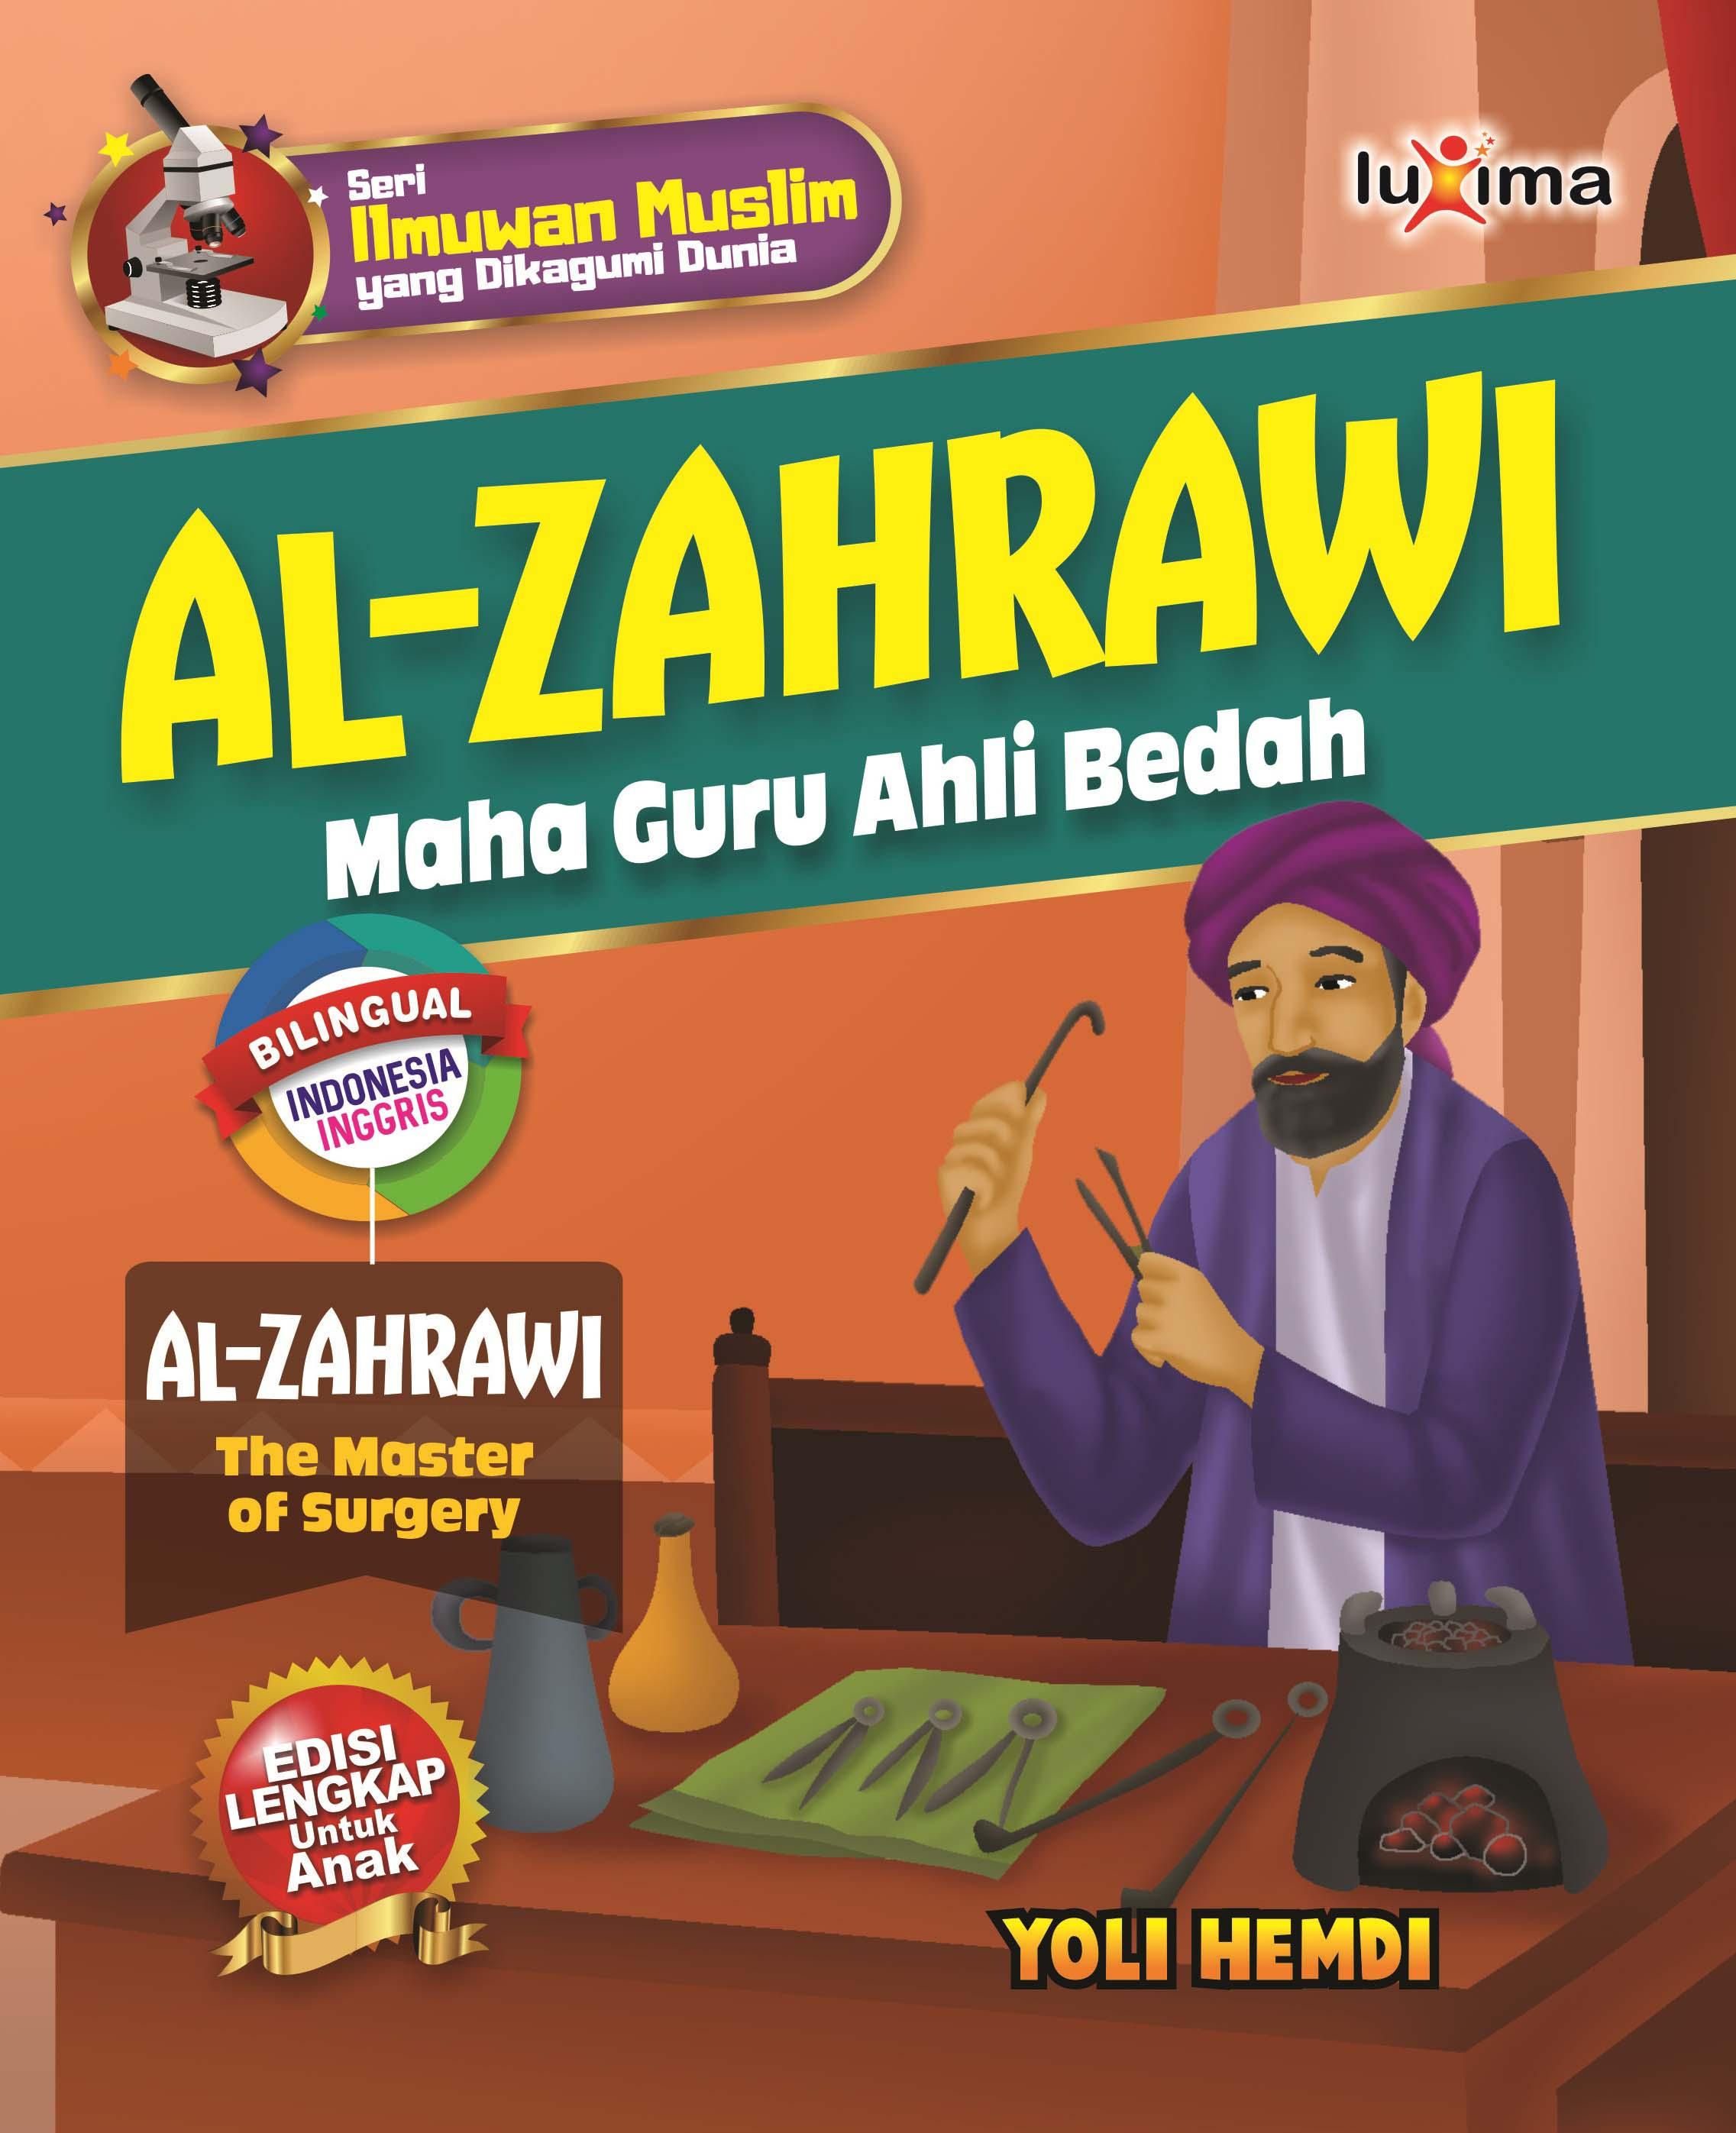 Al-Zahrawi [sumber elektronis] : maha guru ahli bedah = Al-Zahrawi : the master of surgery